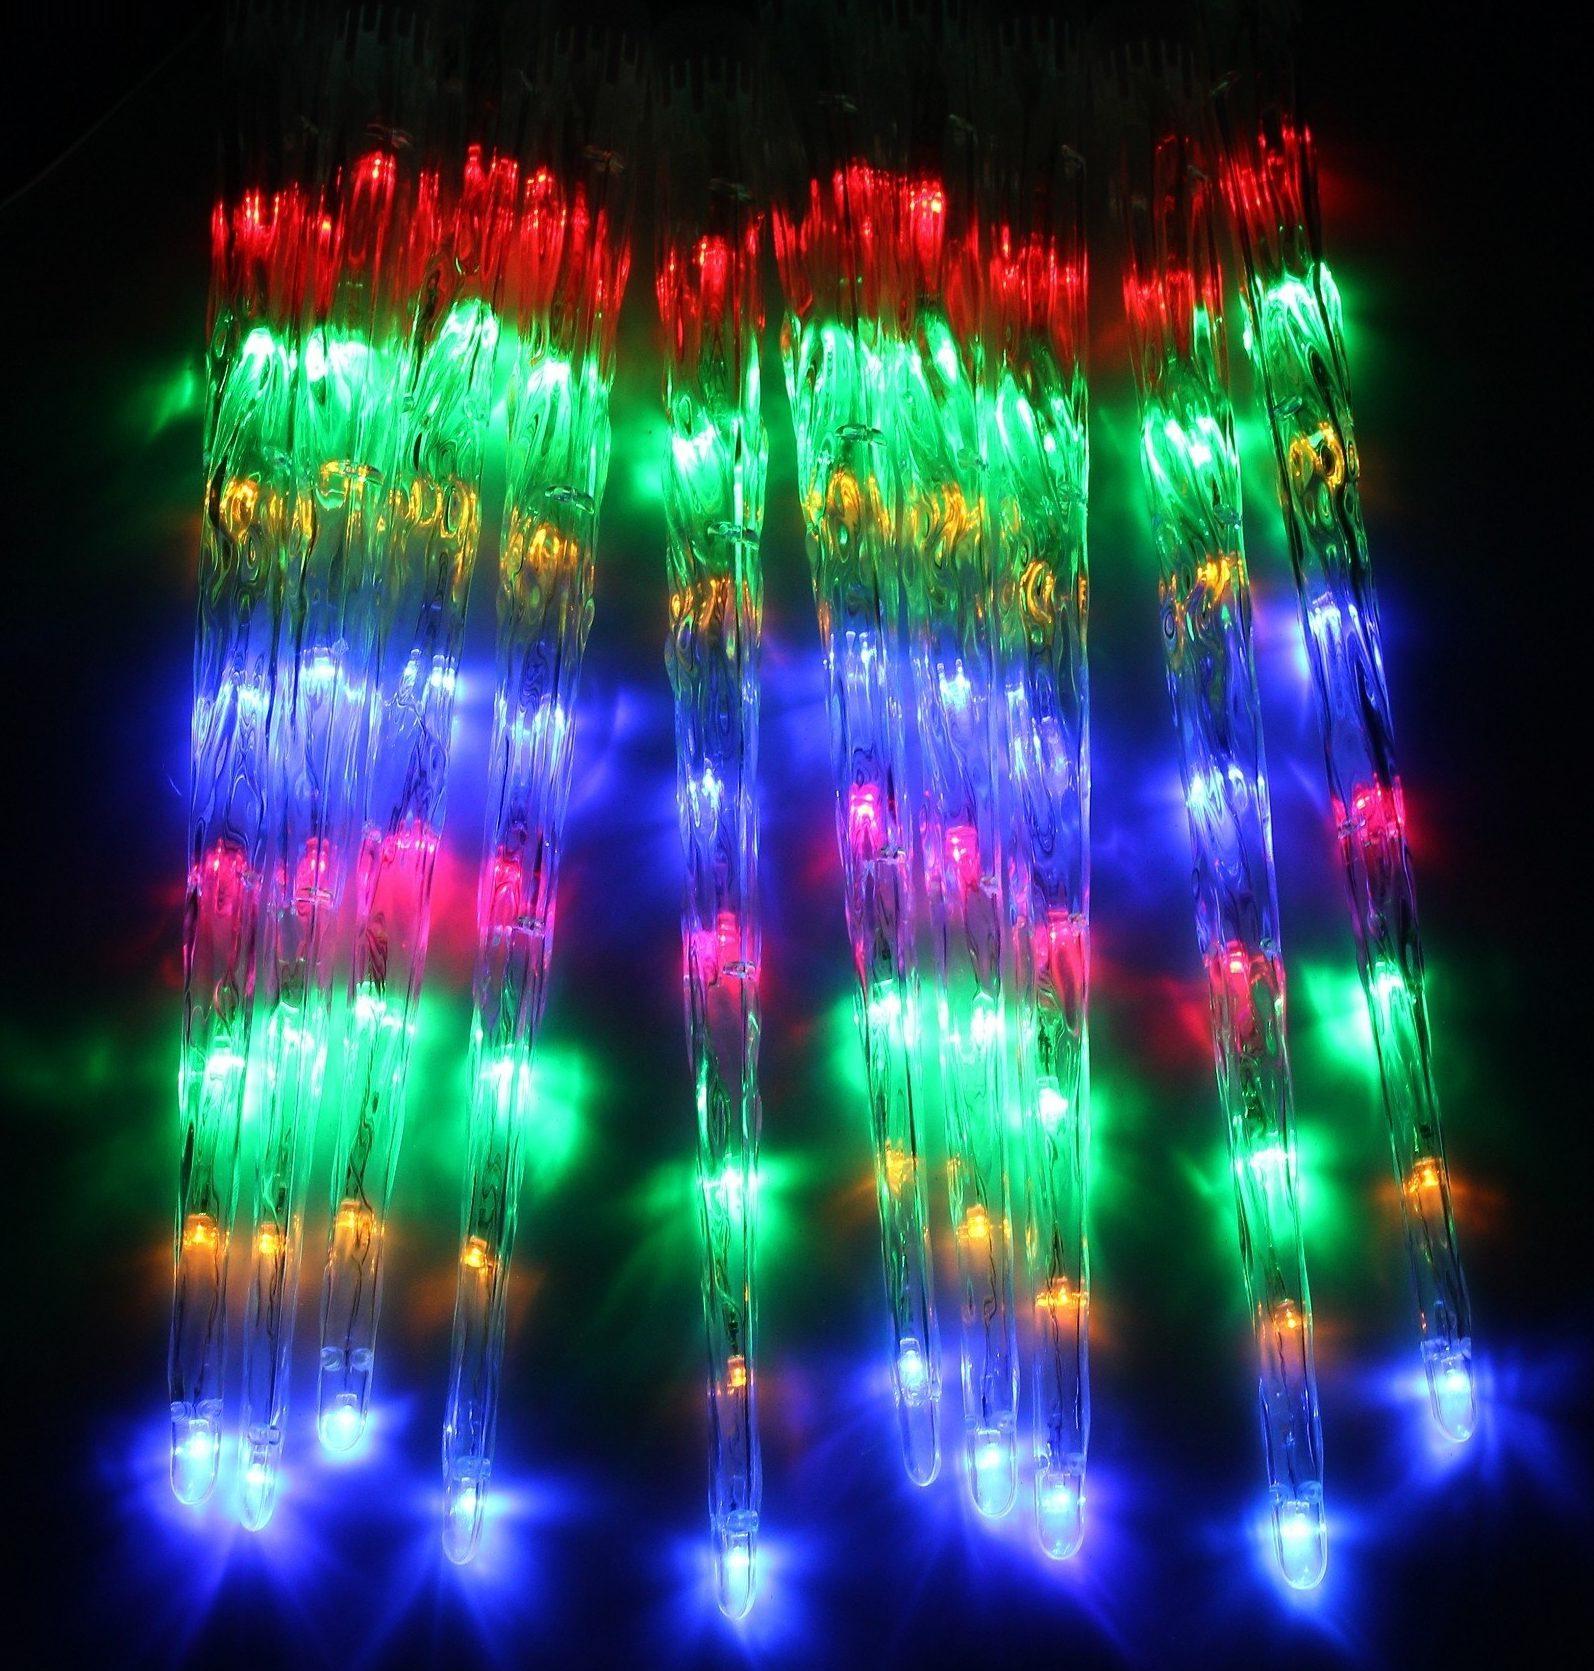 Гирлянда 2,4 м с насад. Сосульки рифленые малые 50 см, LED-64-220V, контр.8 р, МУЛЬТИ